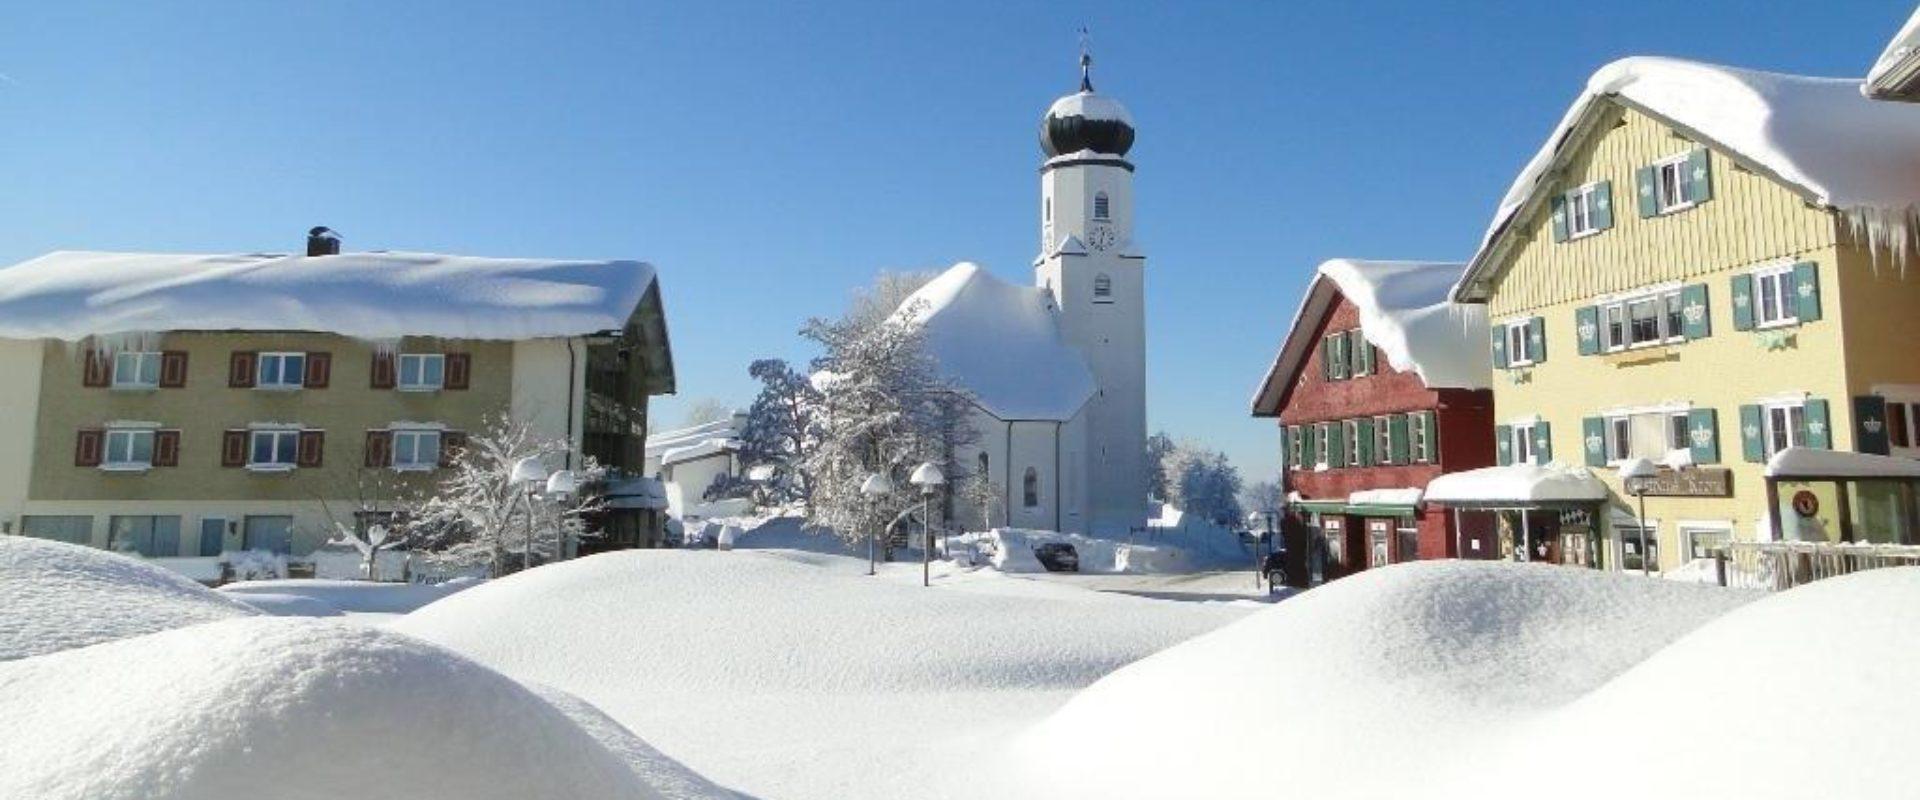 sulzberg_winter (1)